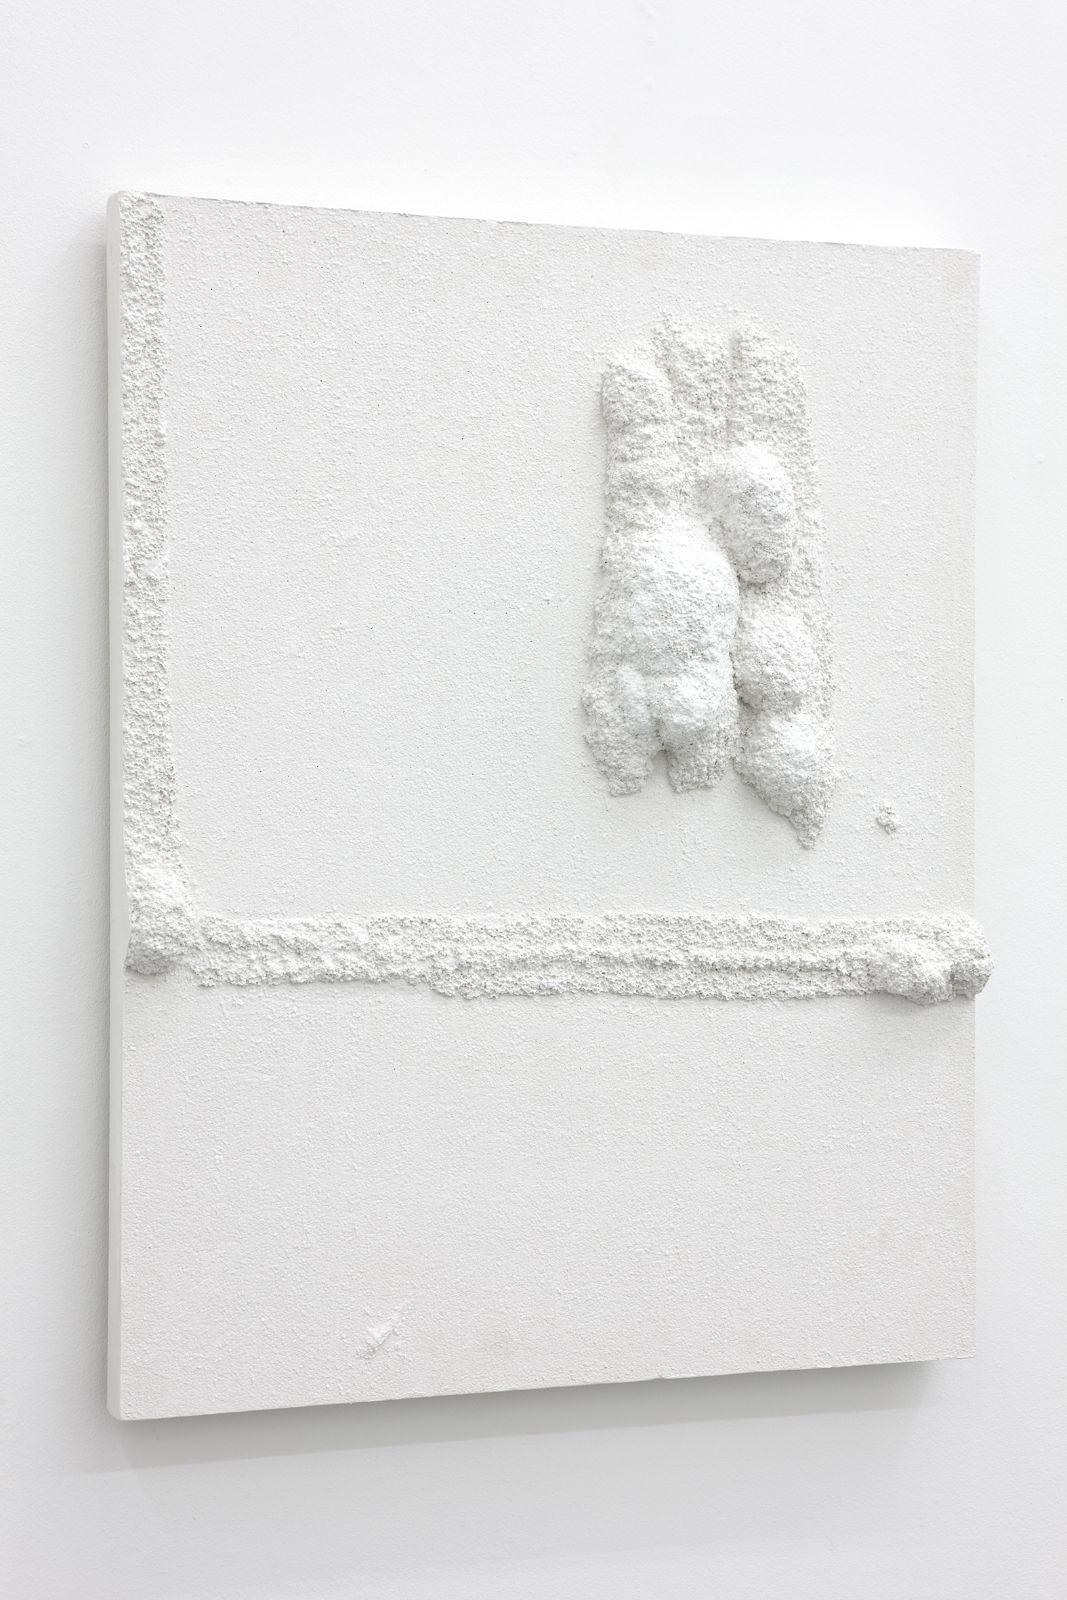 Untitled, 2012, plaster, 75 x 60 x 8,5 cm